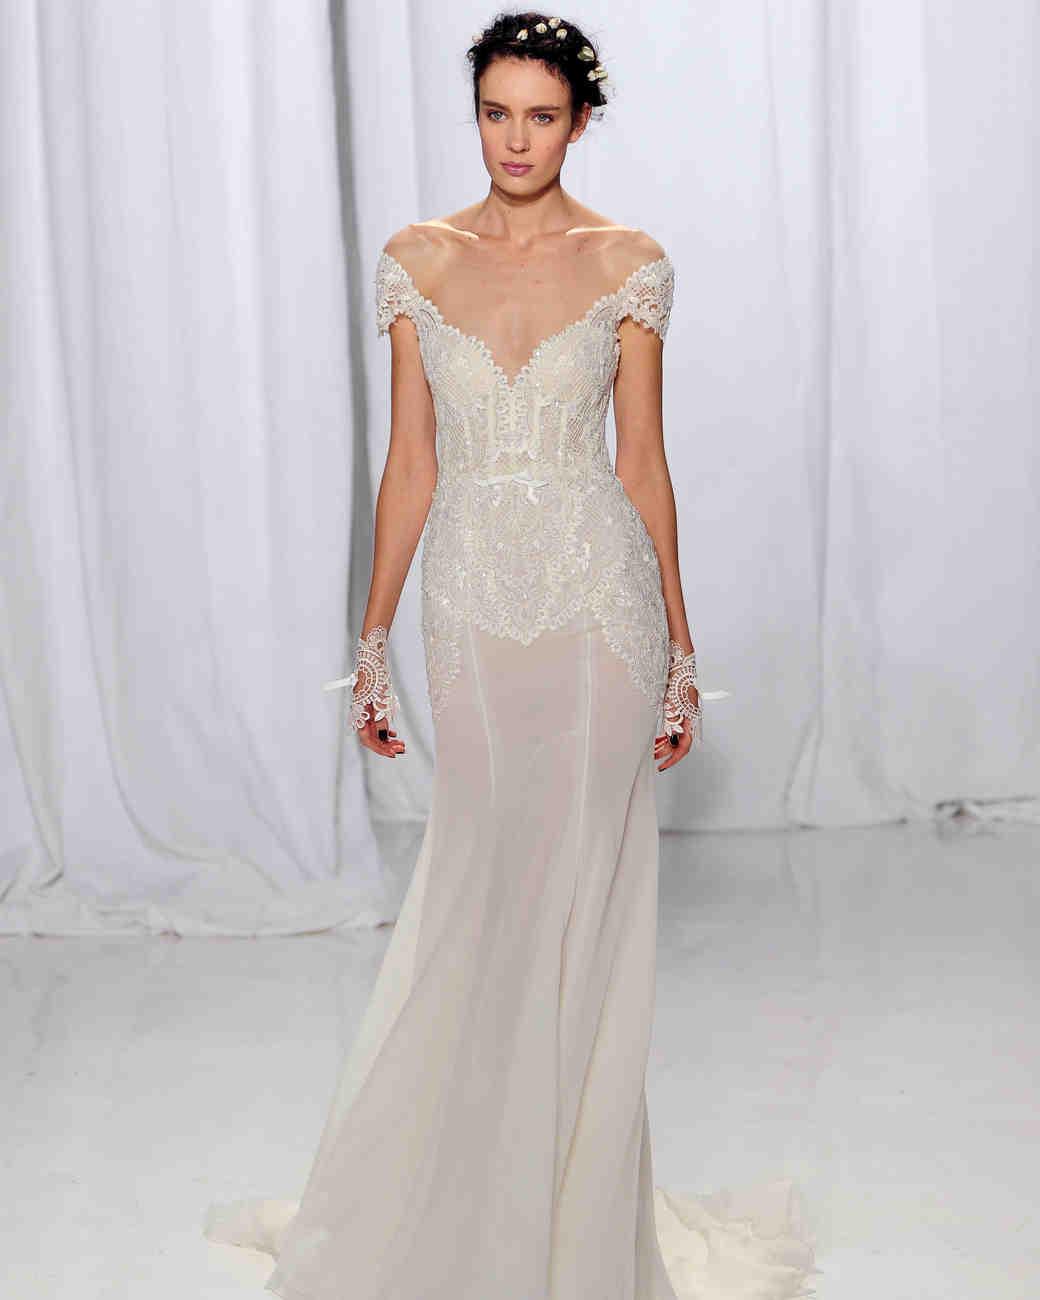 Reem Acra Fall 2017 Wedding Dress Collection | Martha Stewart Weddings